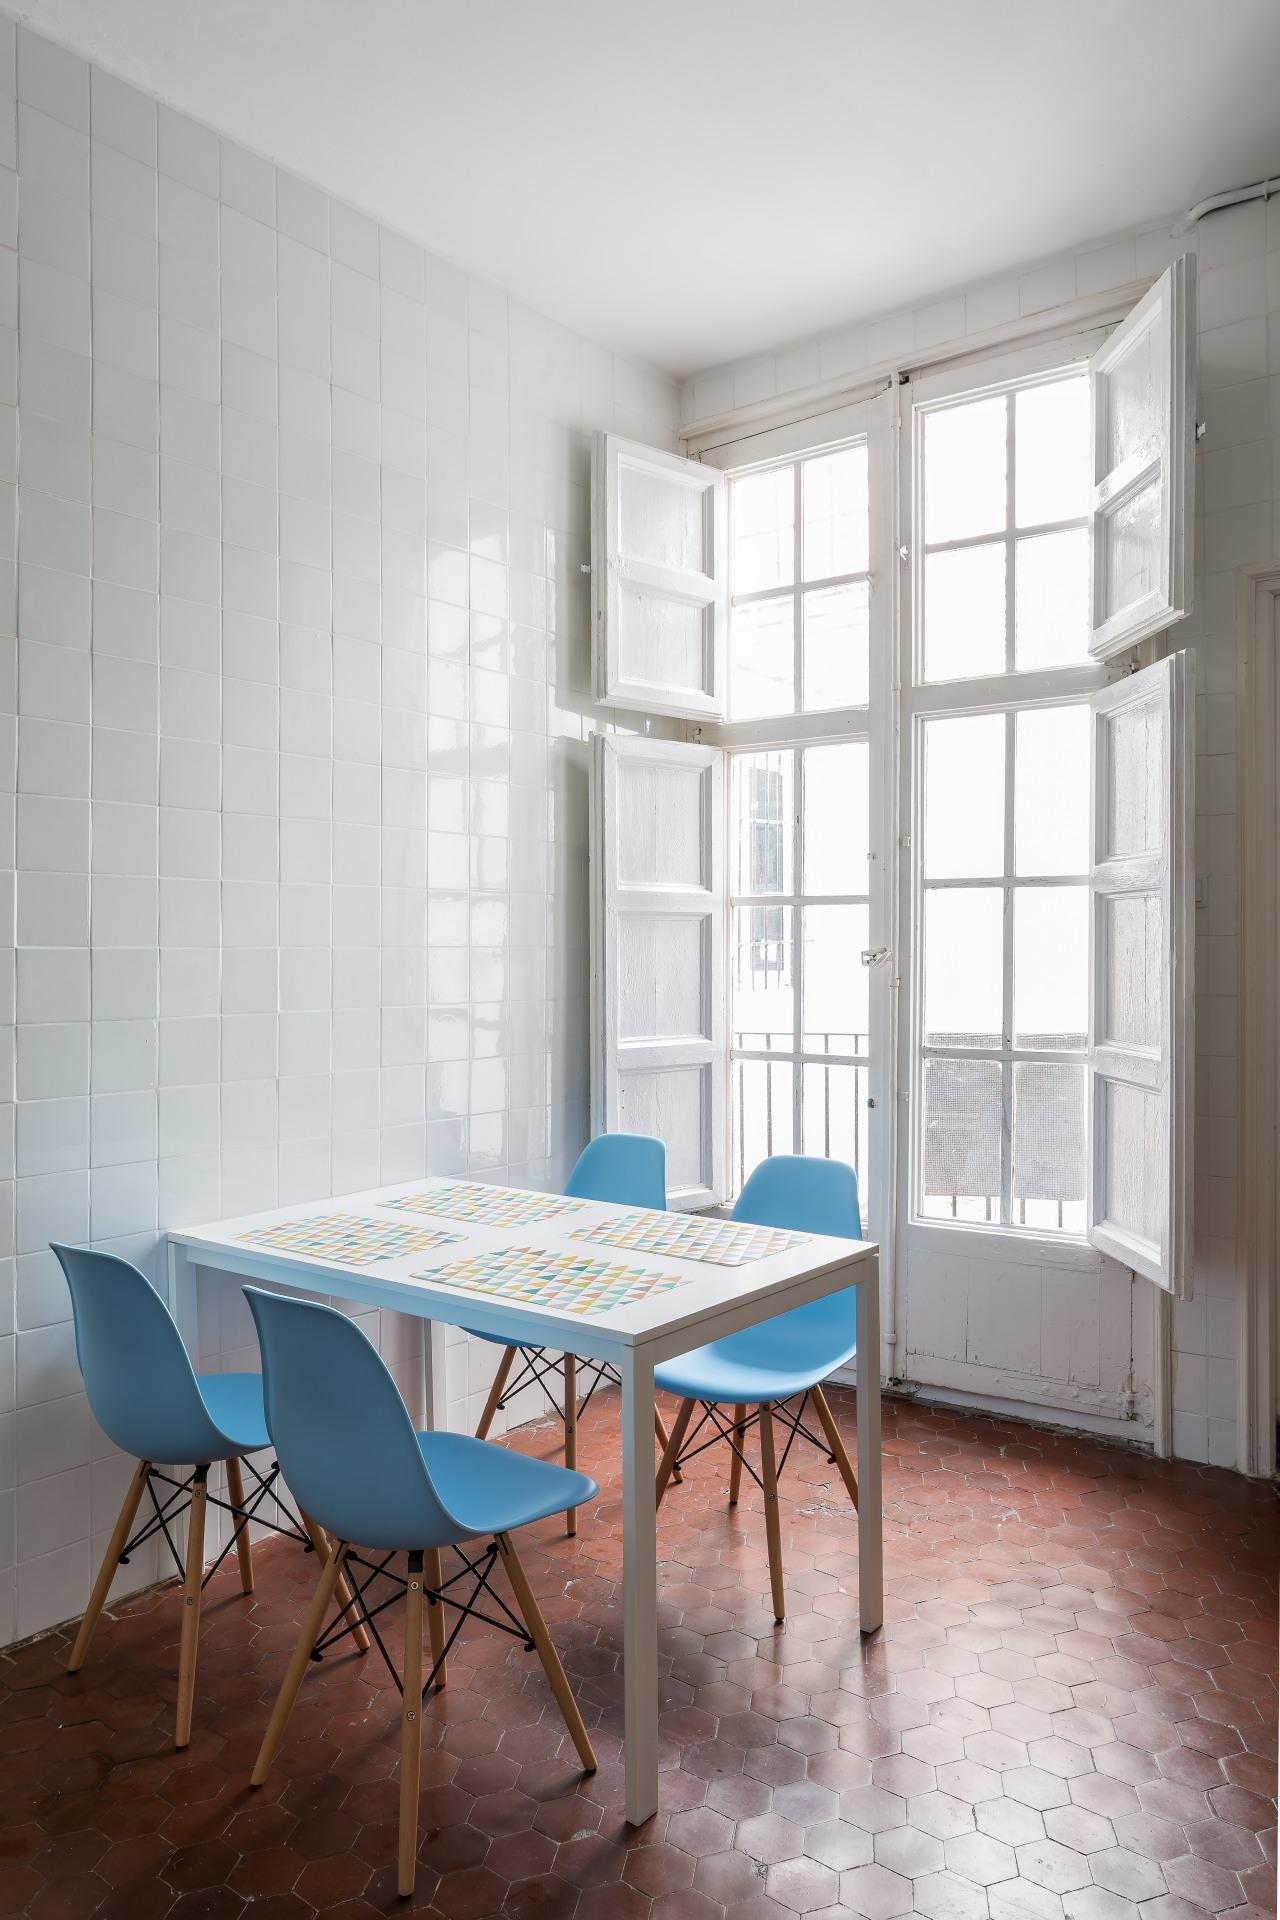 fotografia-arquitectura-interiorismo-valencia-german-cabo-lliberos-naquera-aya (7)